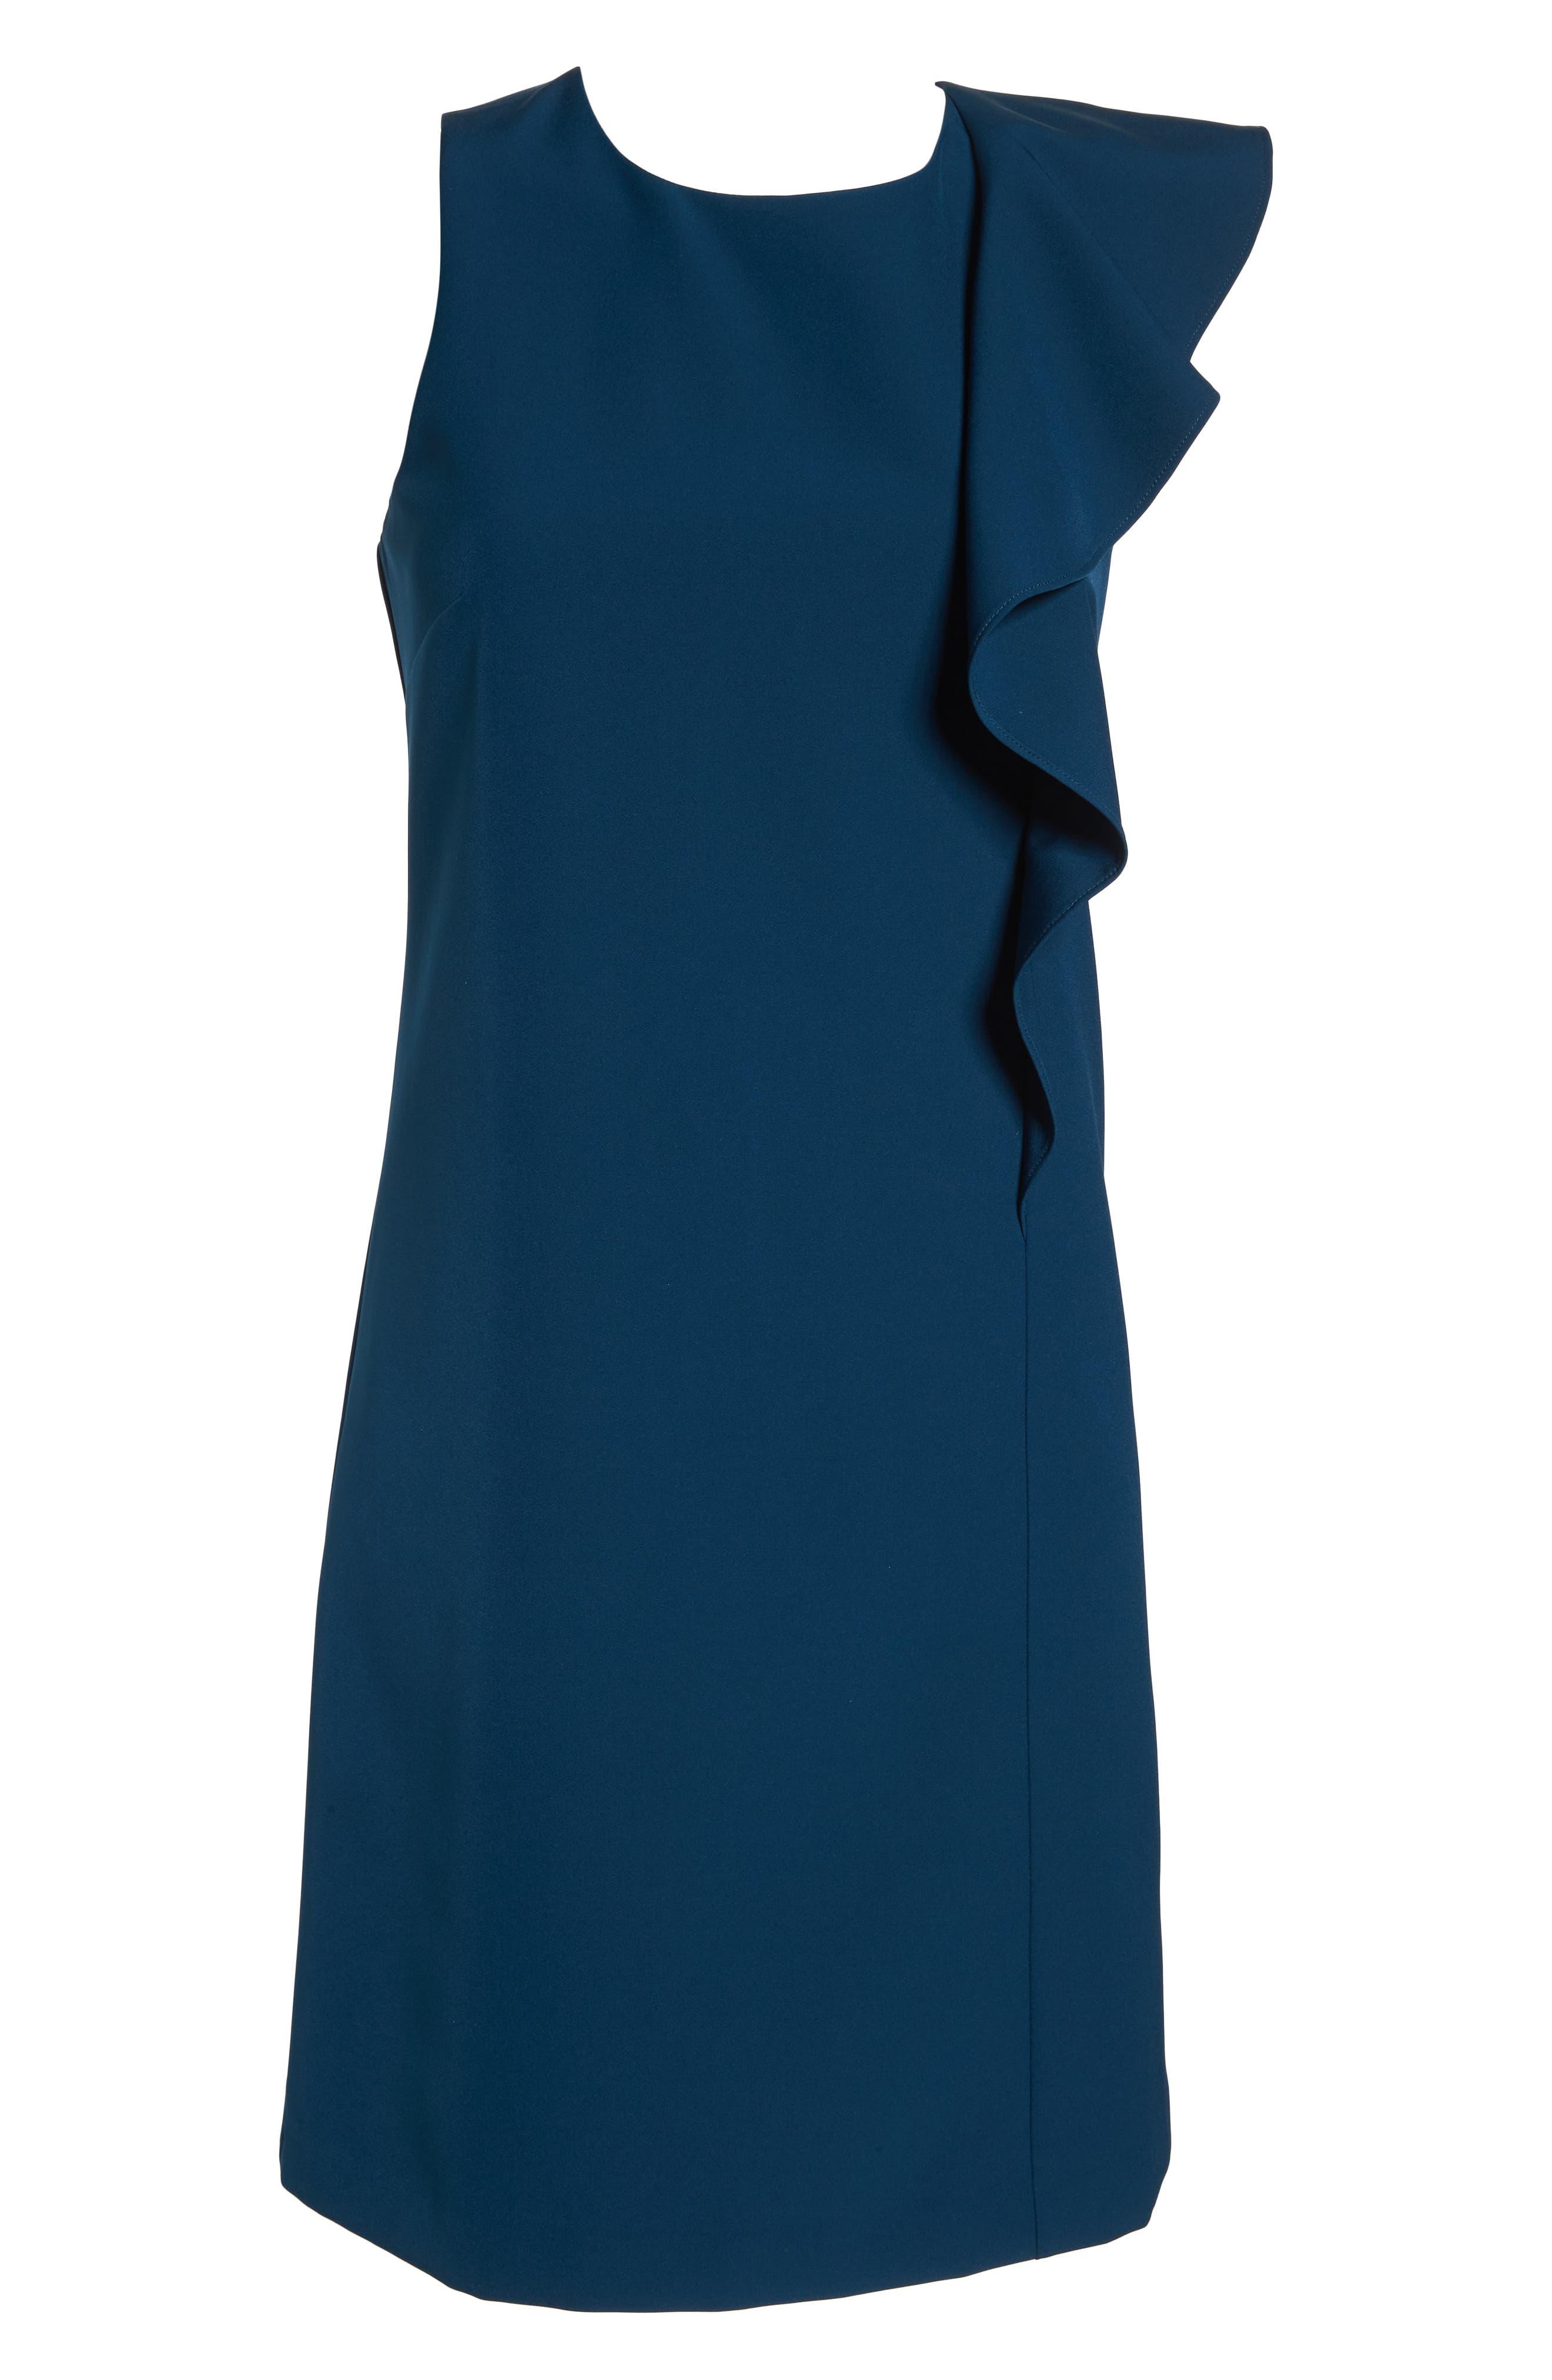 Ruffle Crepe A-Line Dress,                             Alternate thumbnail 7, color,                             Deep Teal